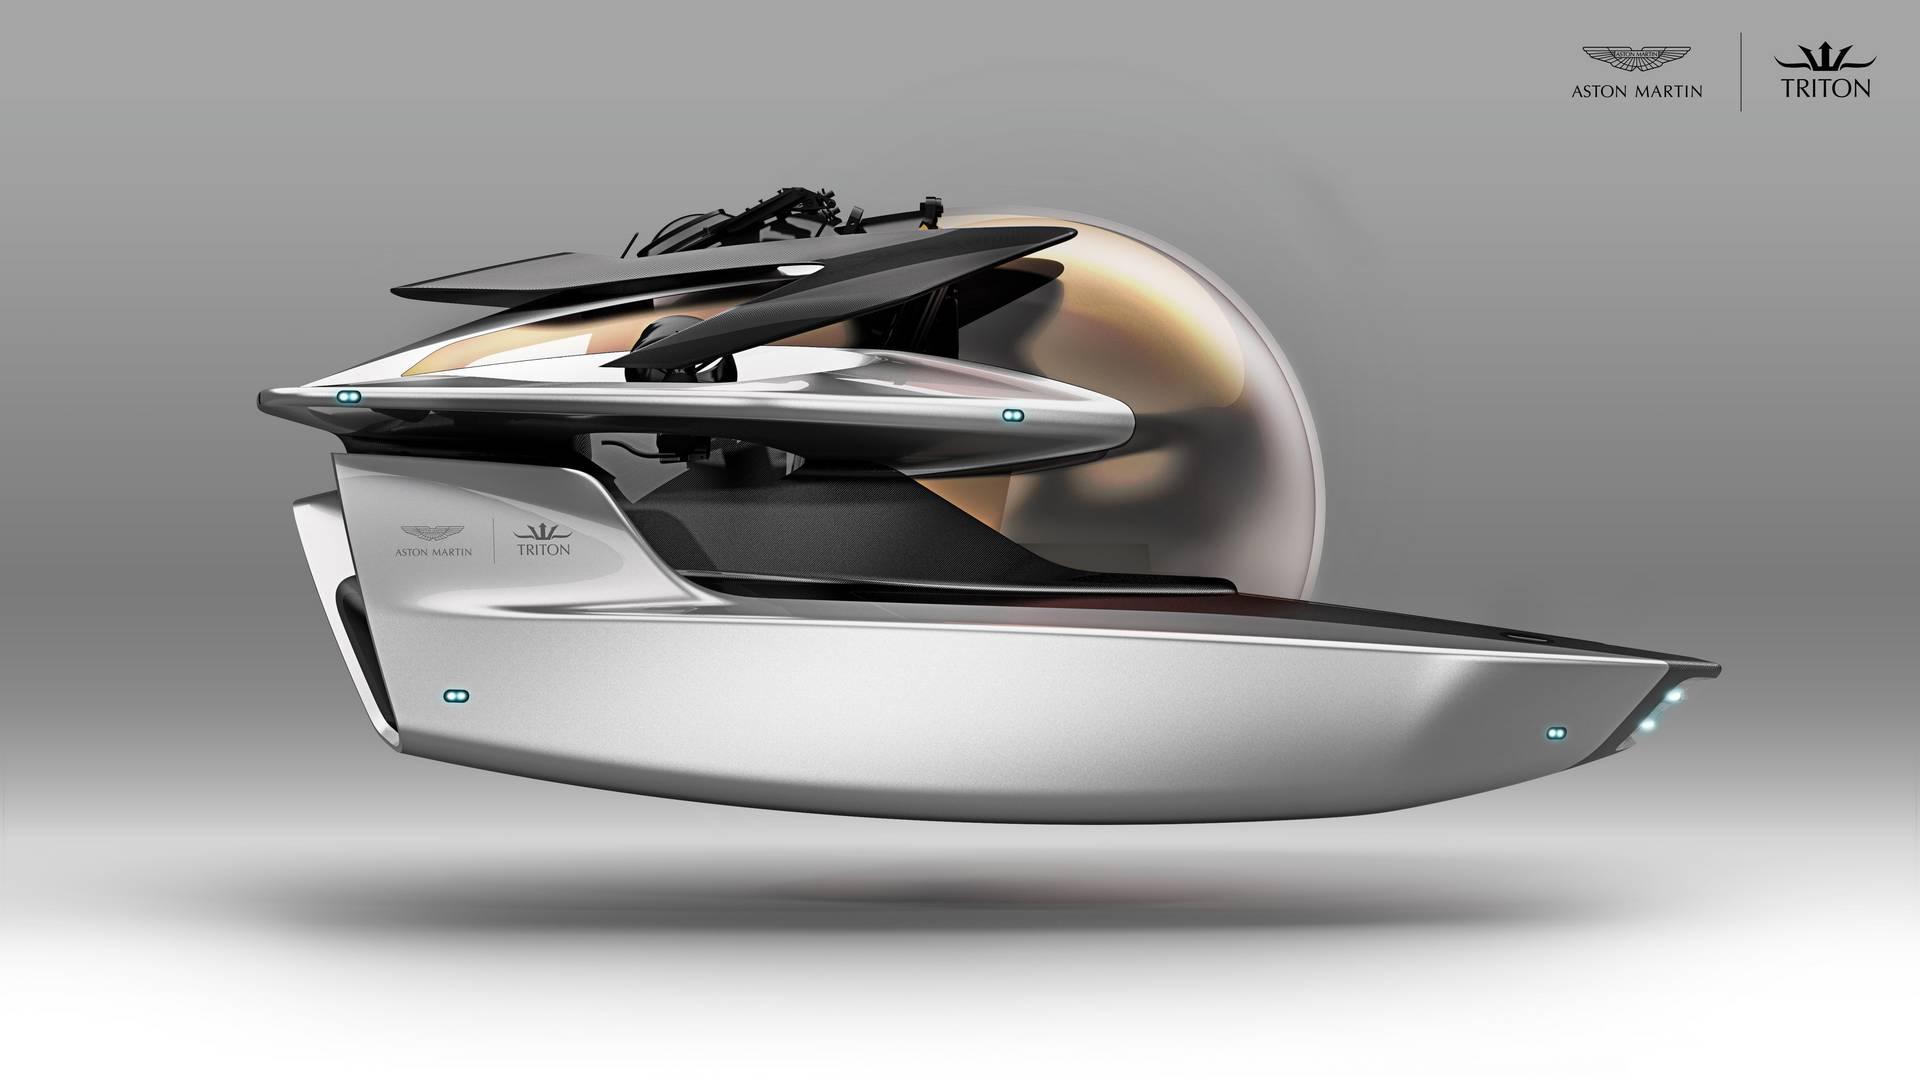 Aston Martin Reveals 4 Million Submarine At Monaco Yacht Show 2017